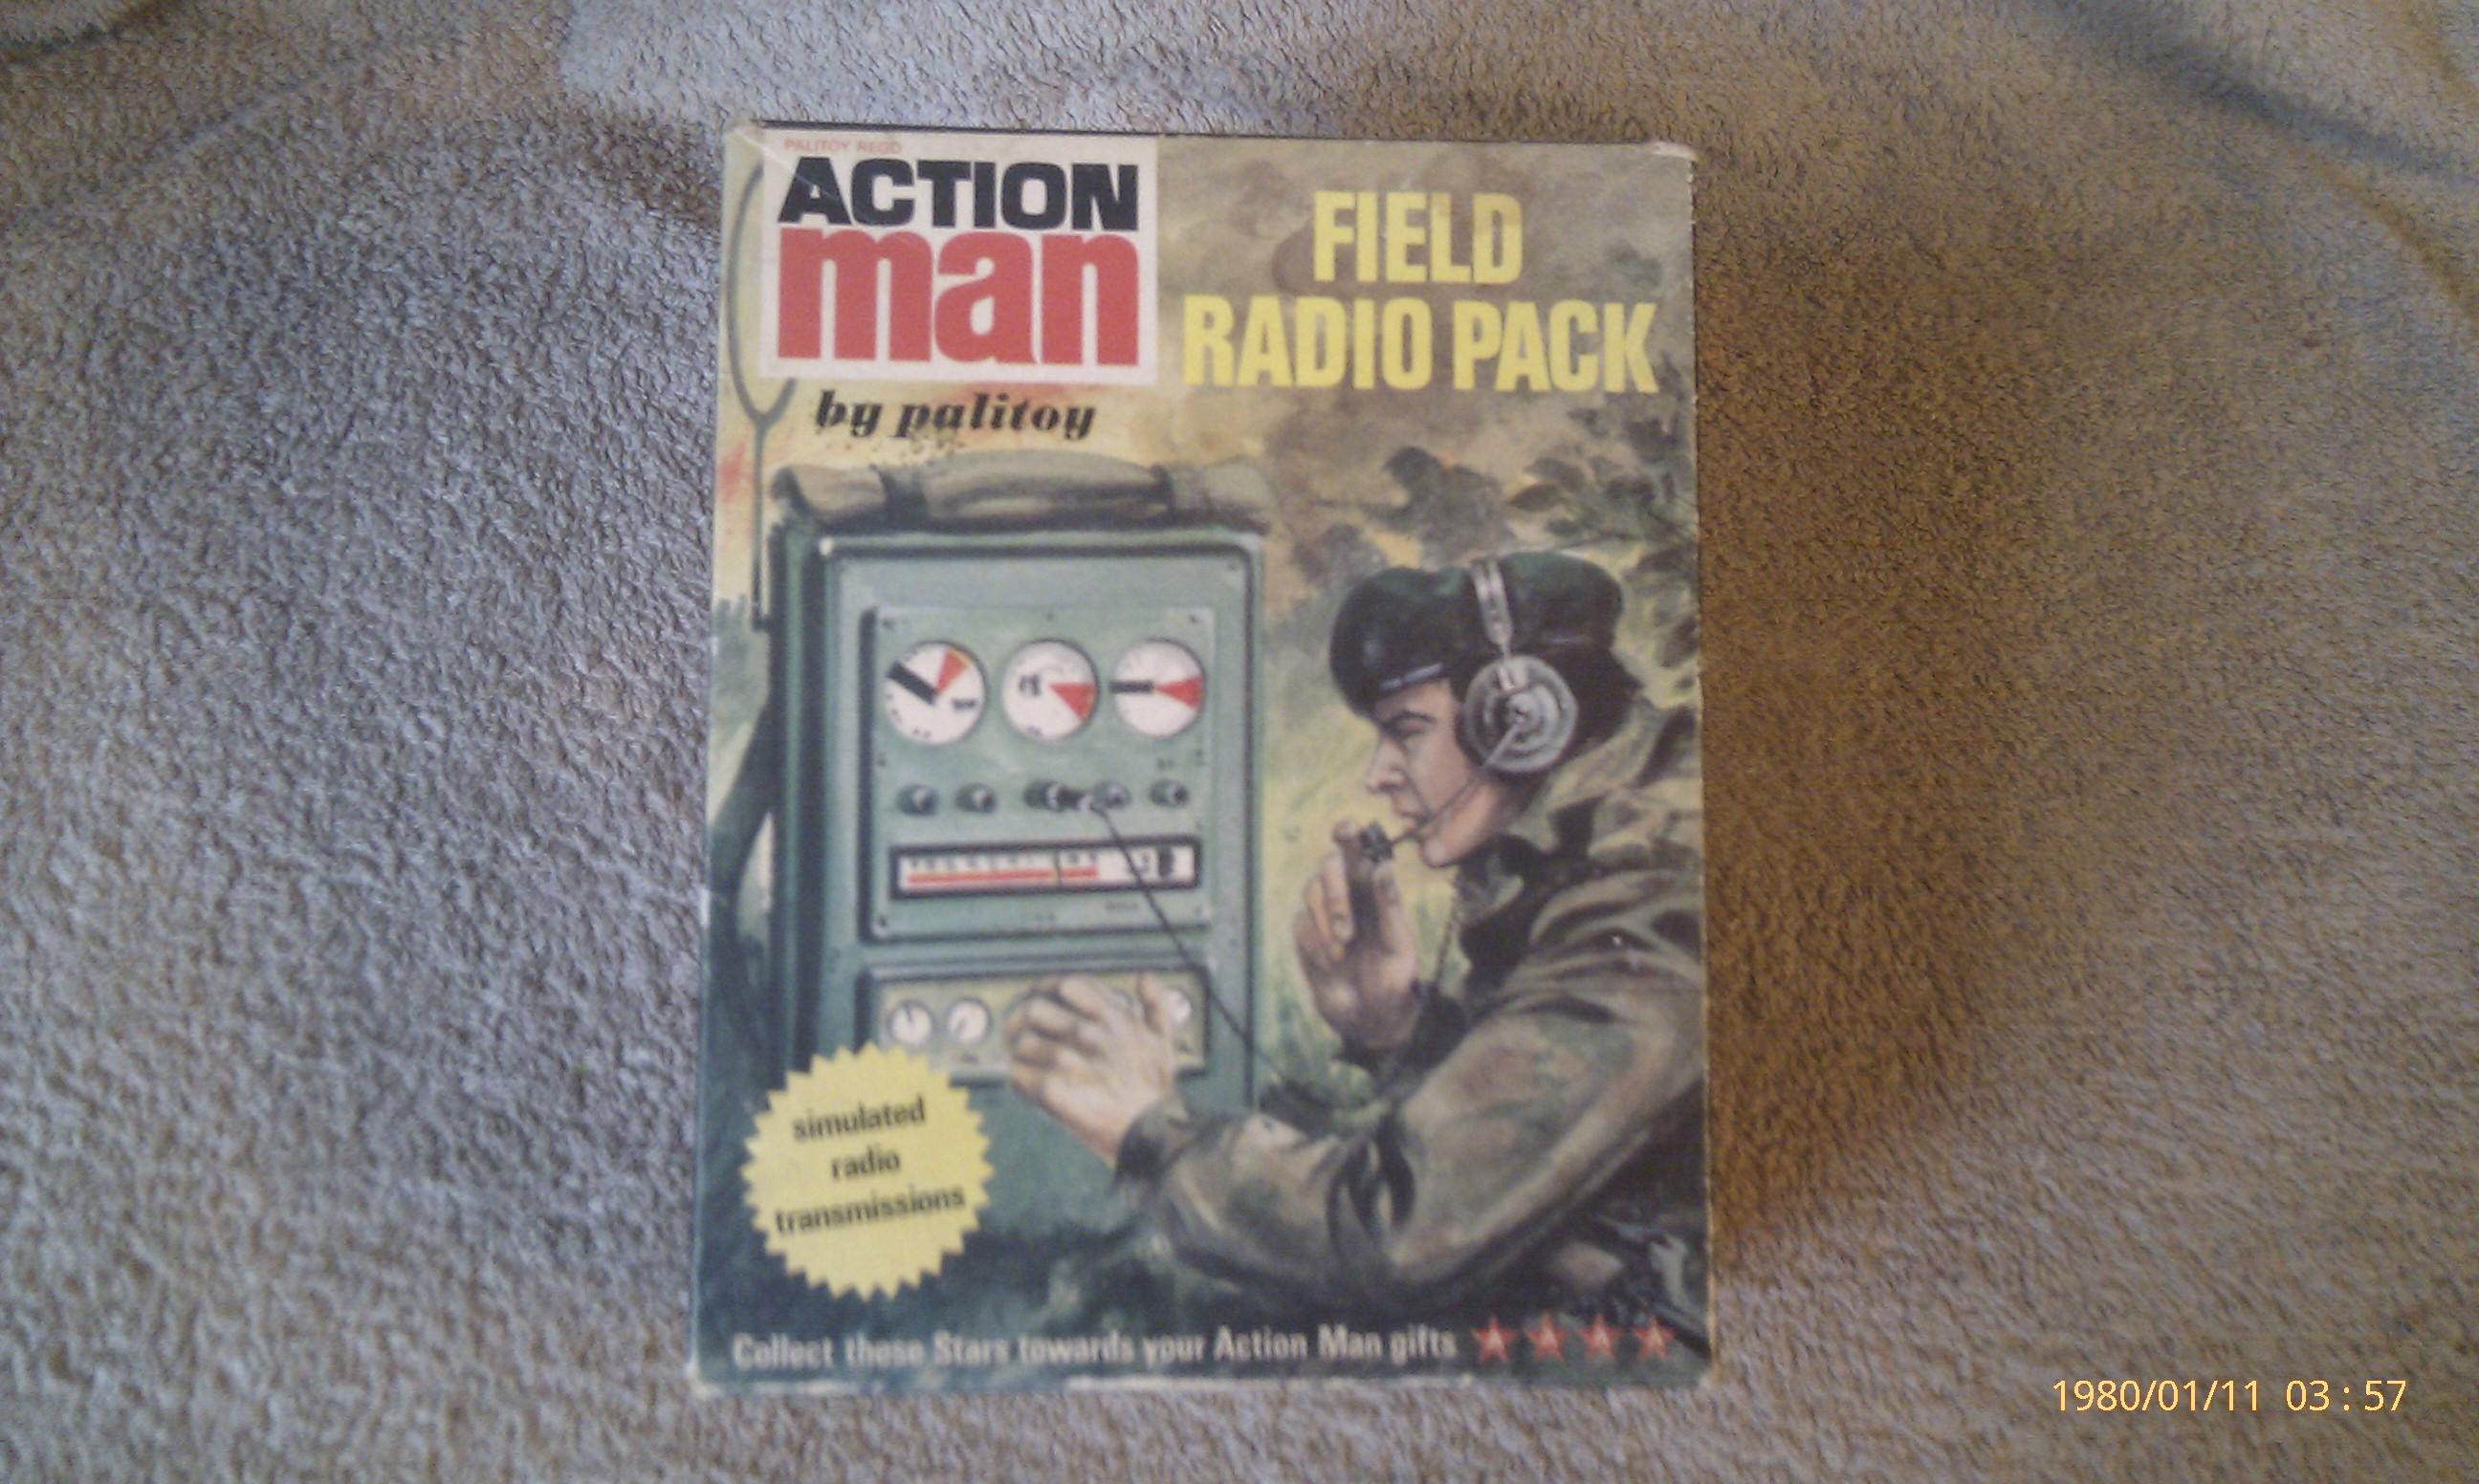 Action Man Field Radio Pack Empty Box